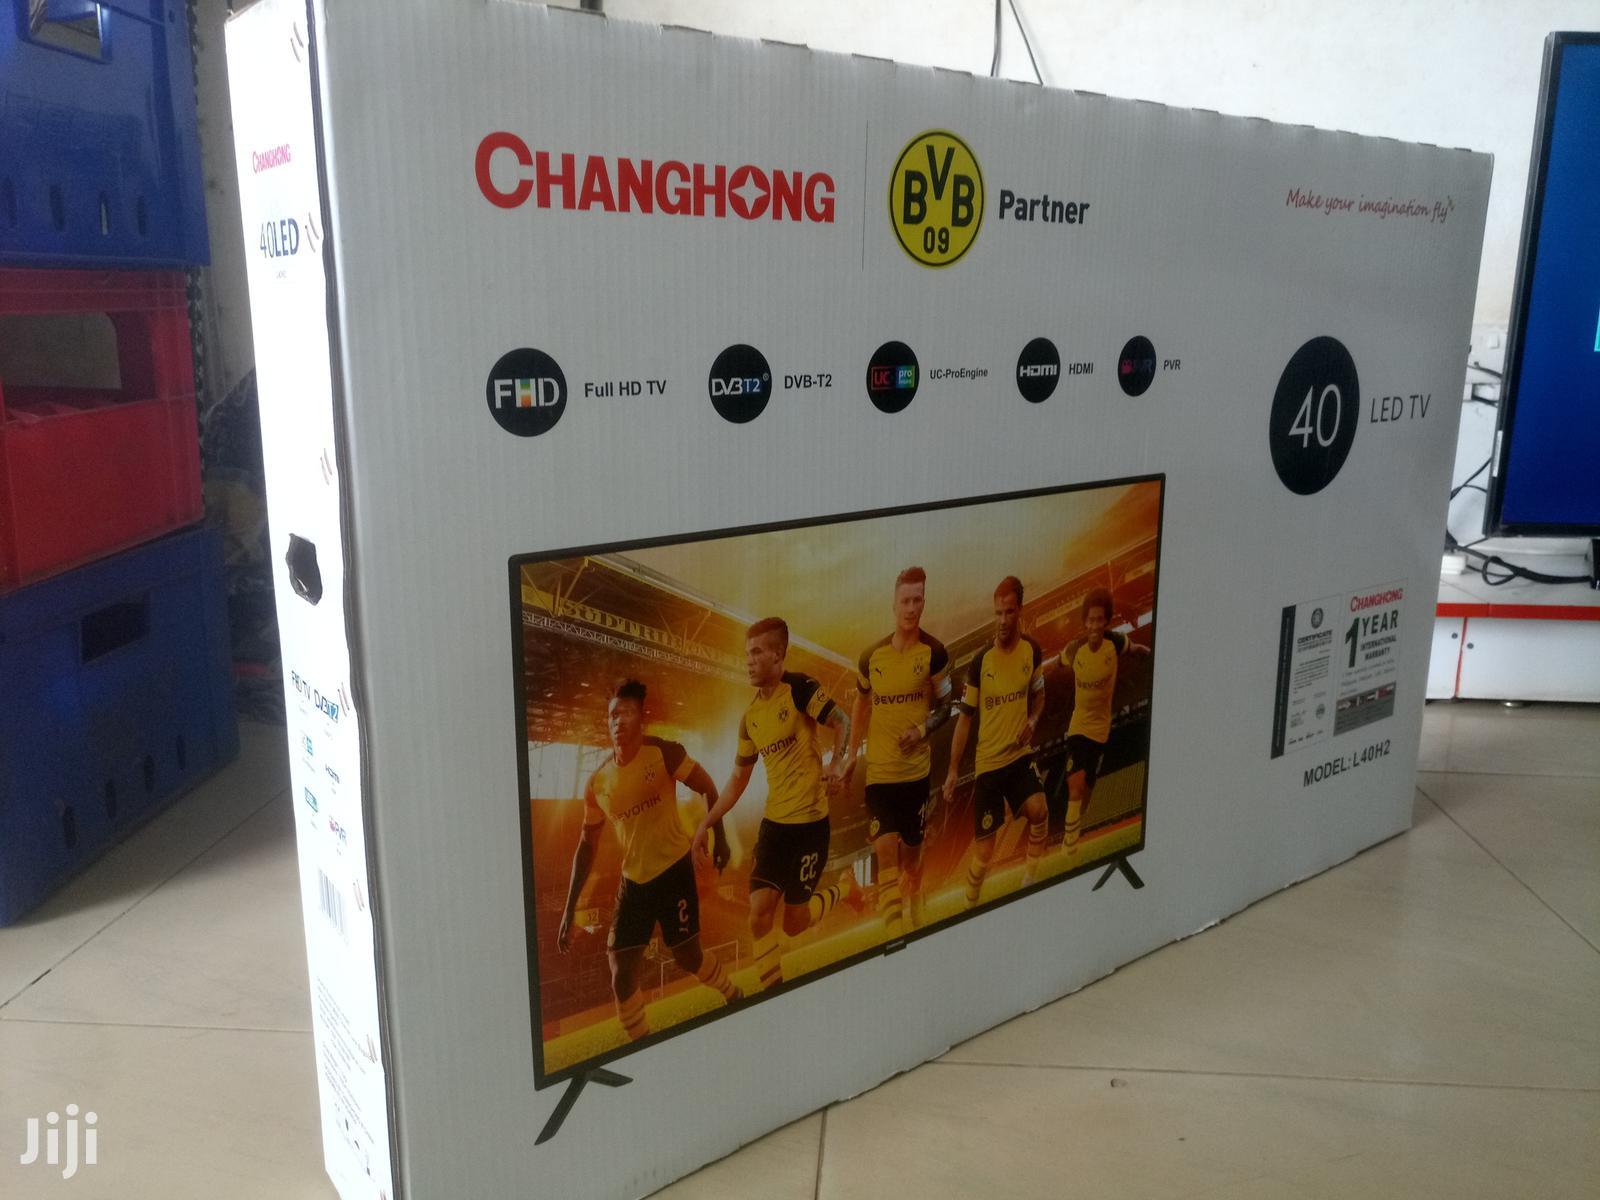 Changhong Flat Screen Digital TV 40 Inches | TV & DVD Equipment for sale in Kampala, Central Region, Uganda